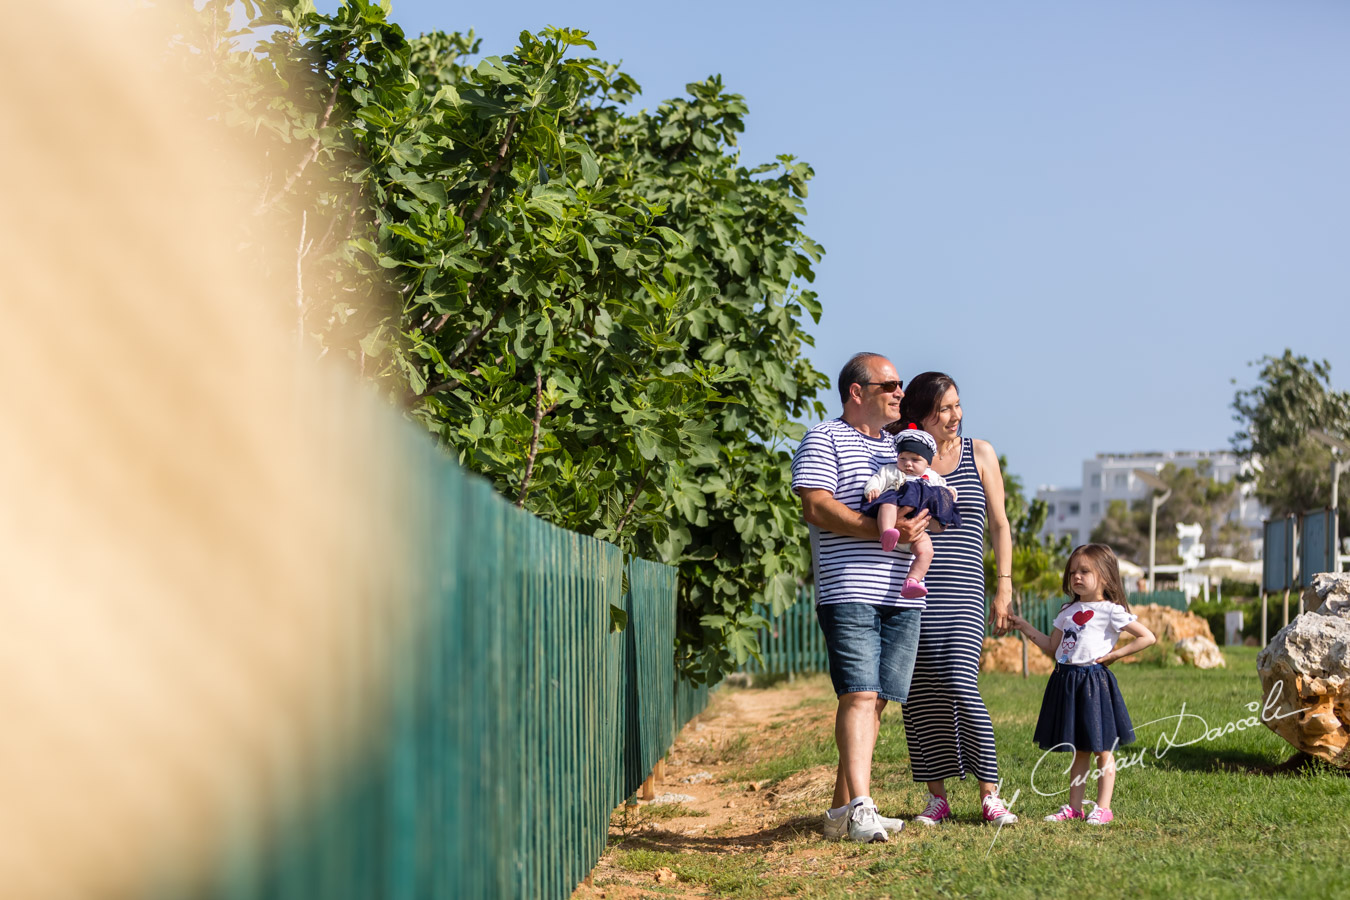 A Family Photo Shoot in Protaras, Cyprus - 02